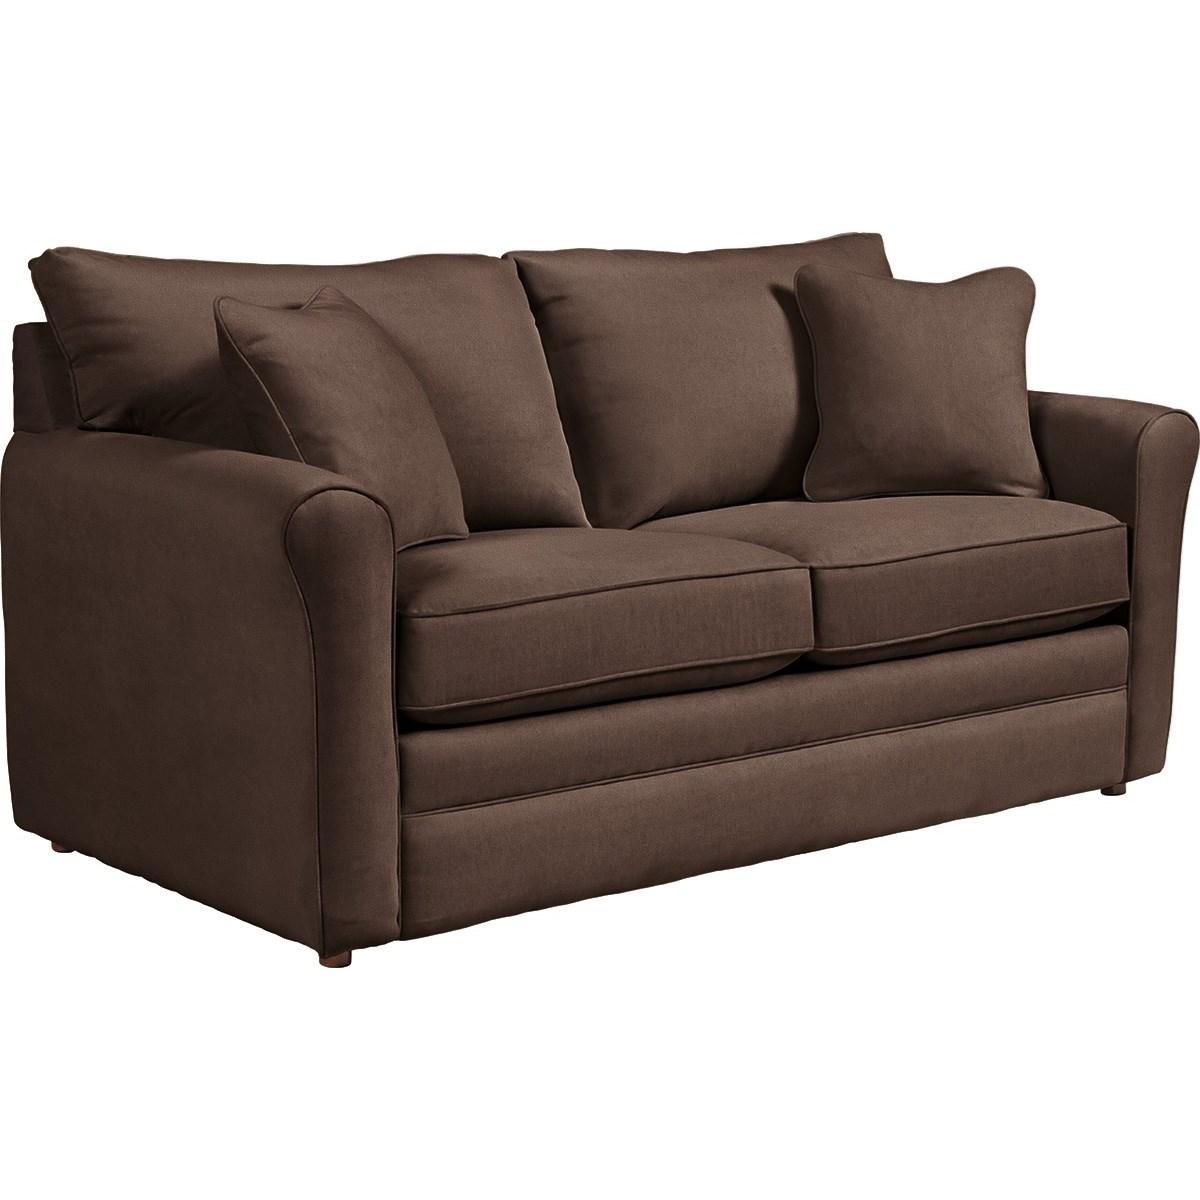 Leah Full Sleep Sofa w/ SlumberAir® Mattress by La-Z-Boy at Johnny Janosik